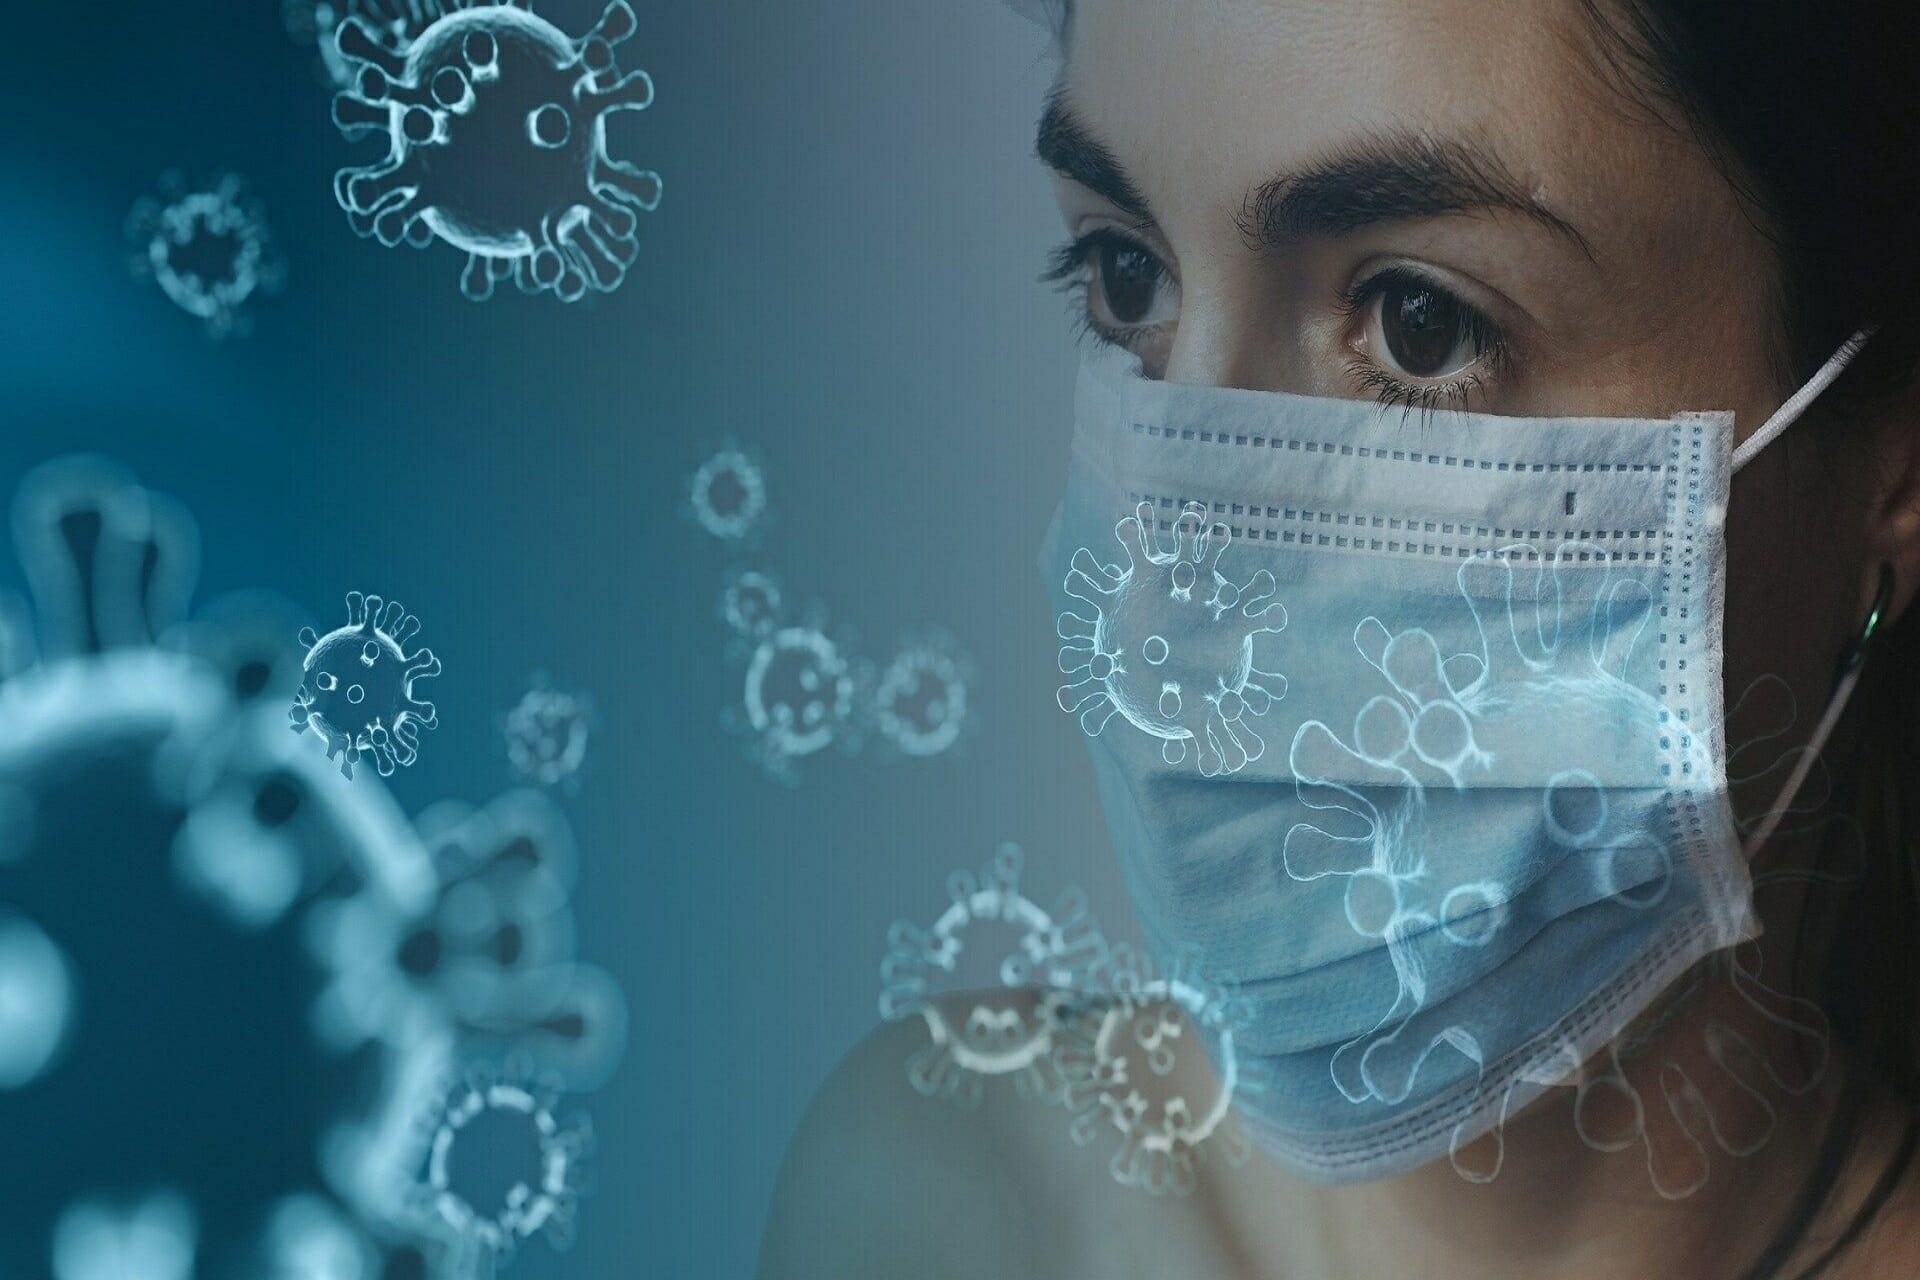 smarthealth paycard waives annual fee over coronavirus